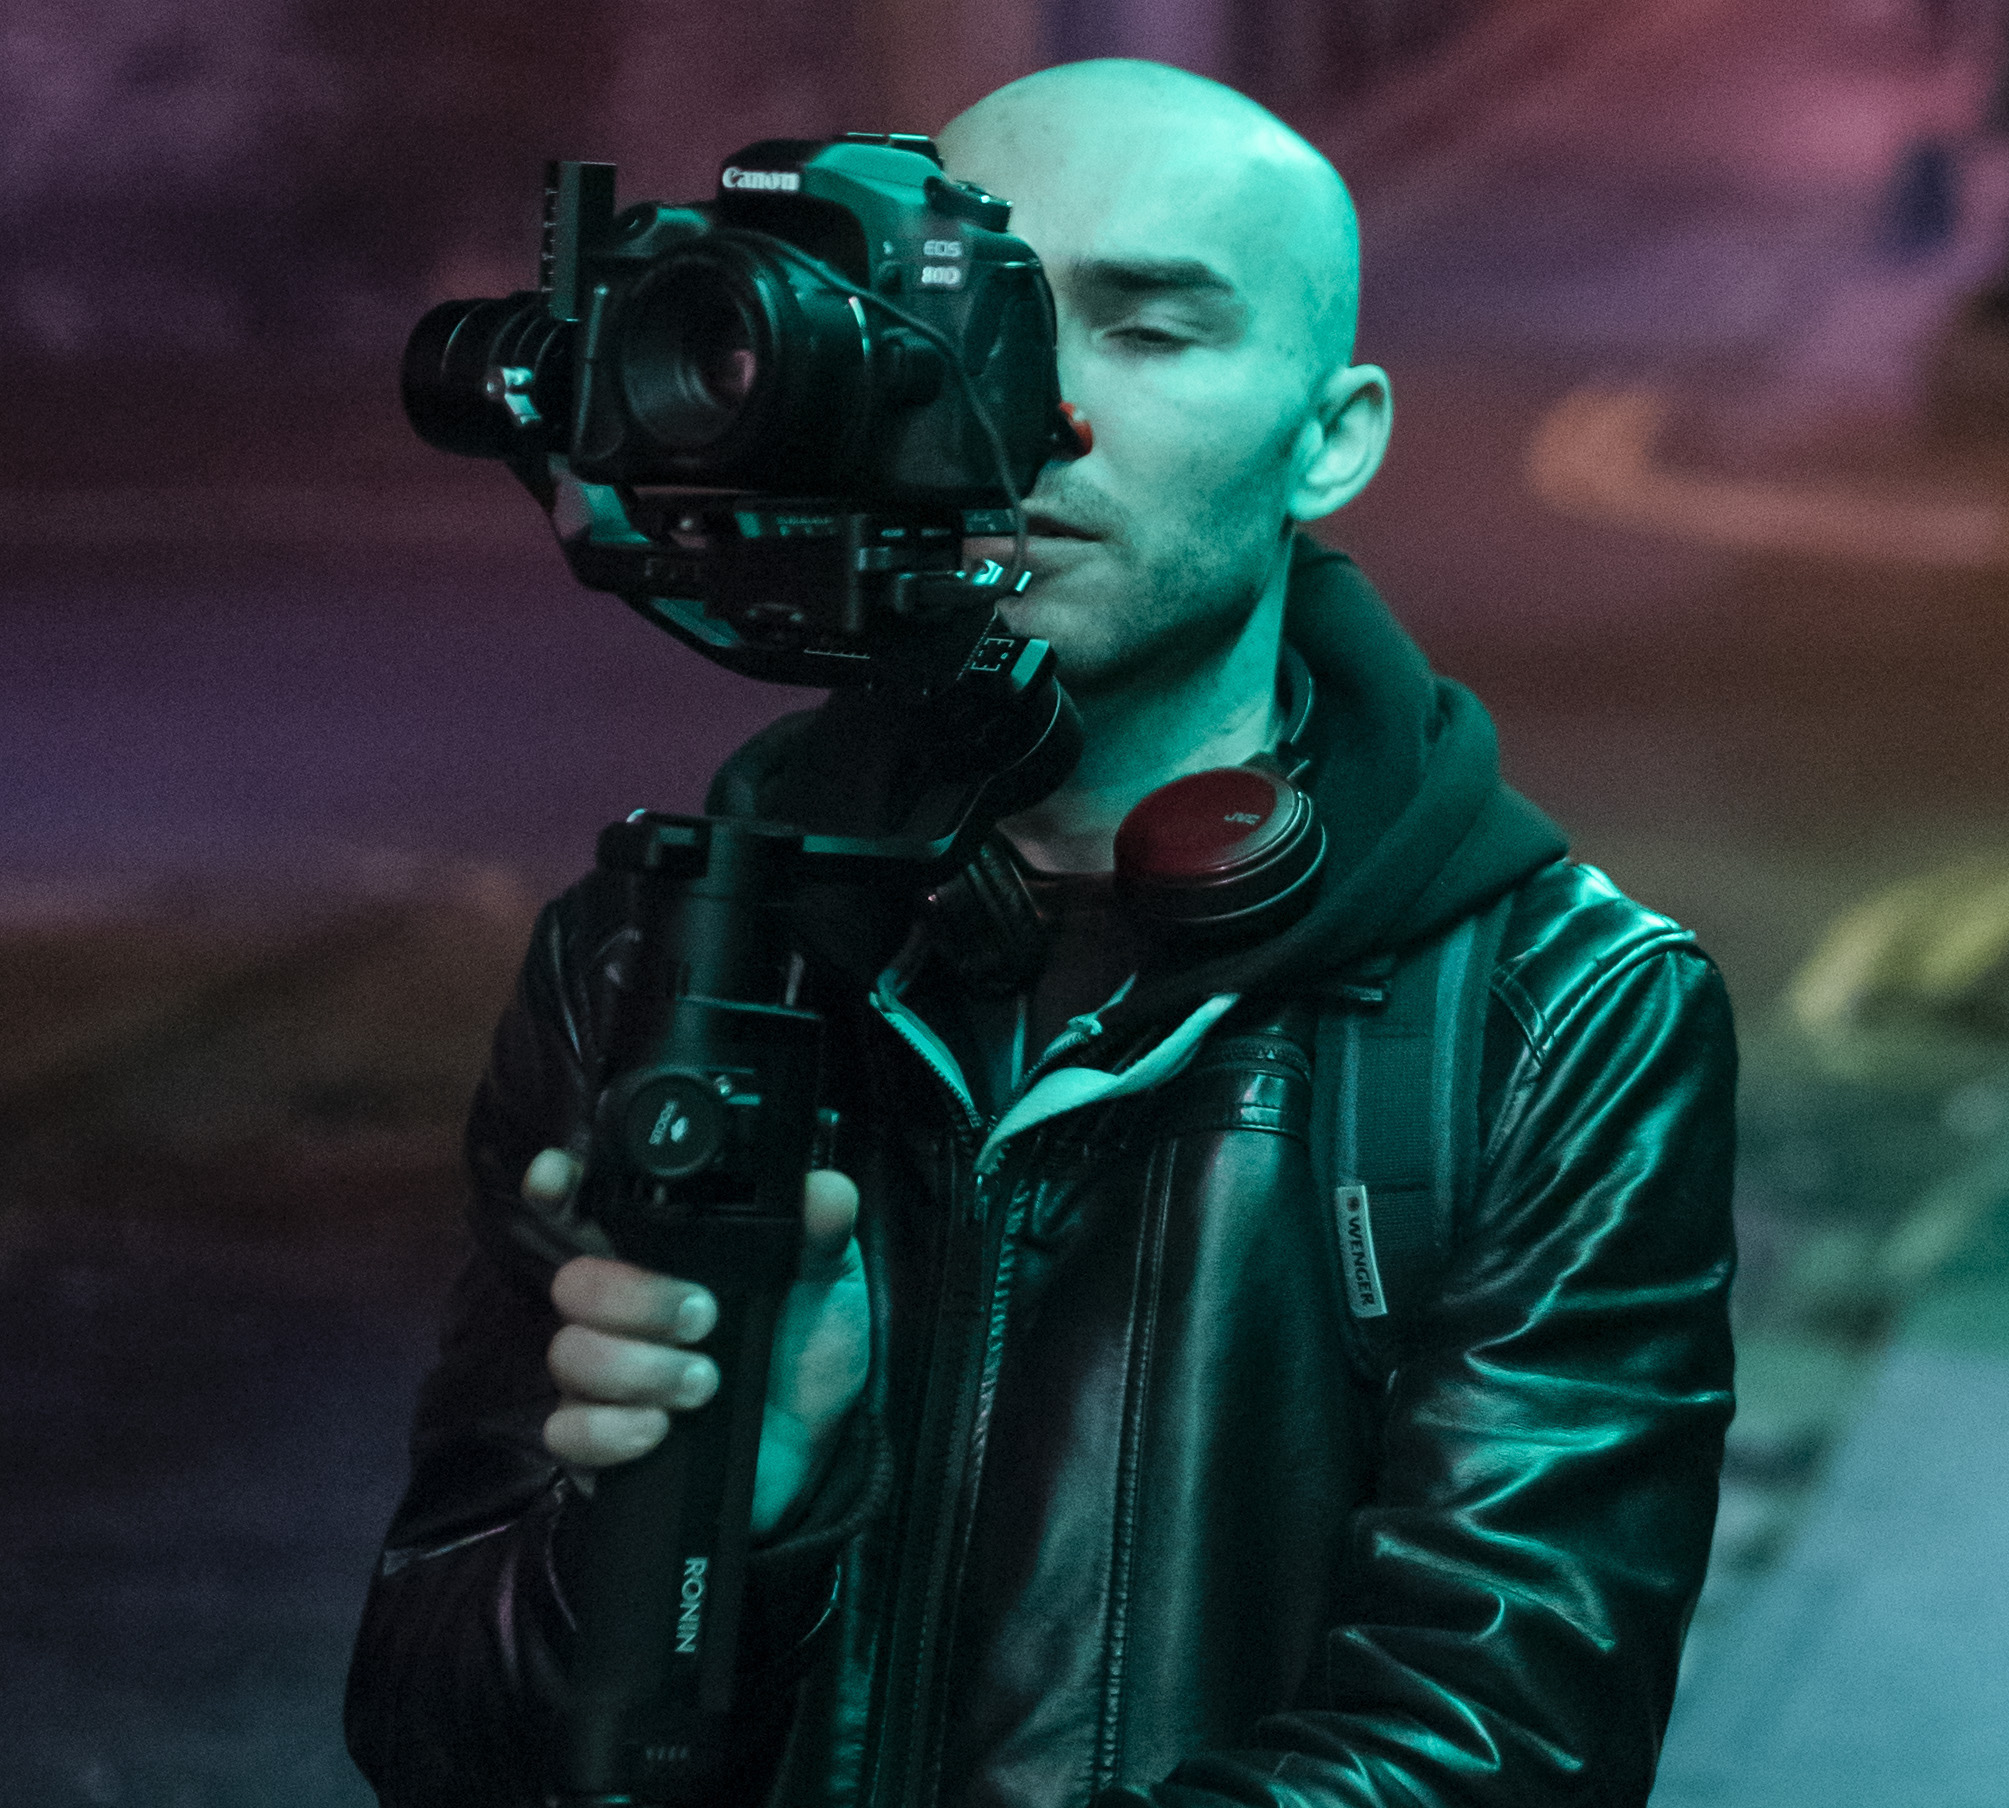 ALAN CIECHALSKI 🇵🇱🇬🇧@THEALANCIE - CHEF DE FILM AT CUSTOM FLAVOUR LTD.SHARP EDITING SKILLSGREAT TASTE FOR MUSICFRESH IDEAS EVERY DAY5-STAR SERVICE